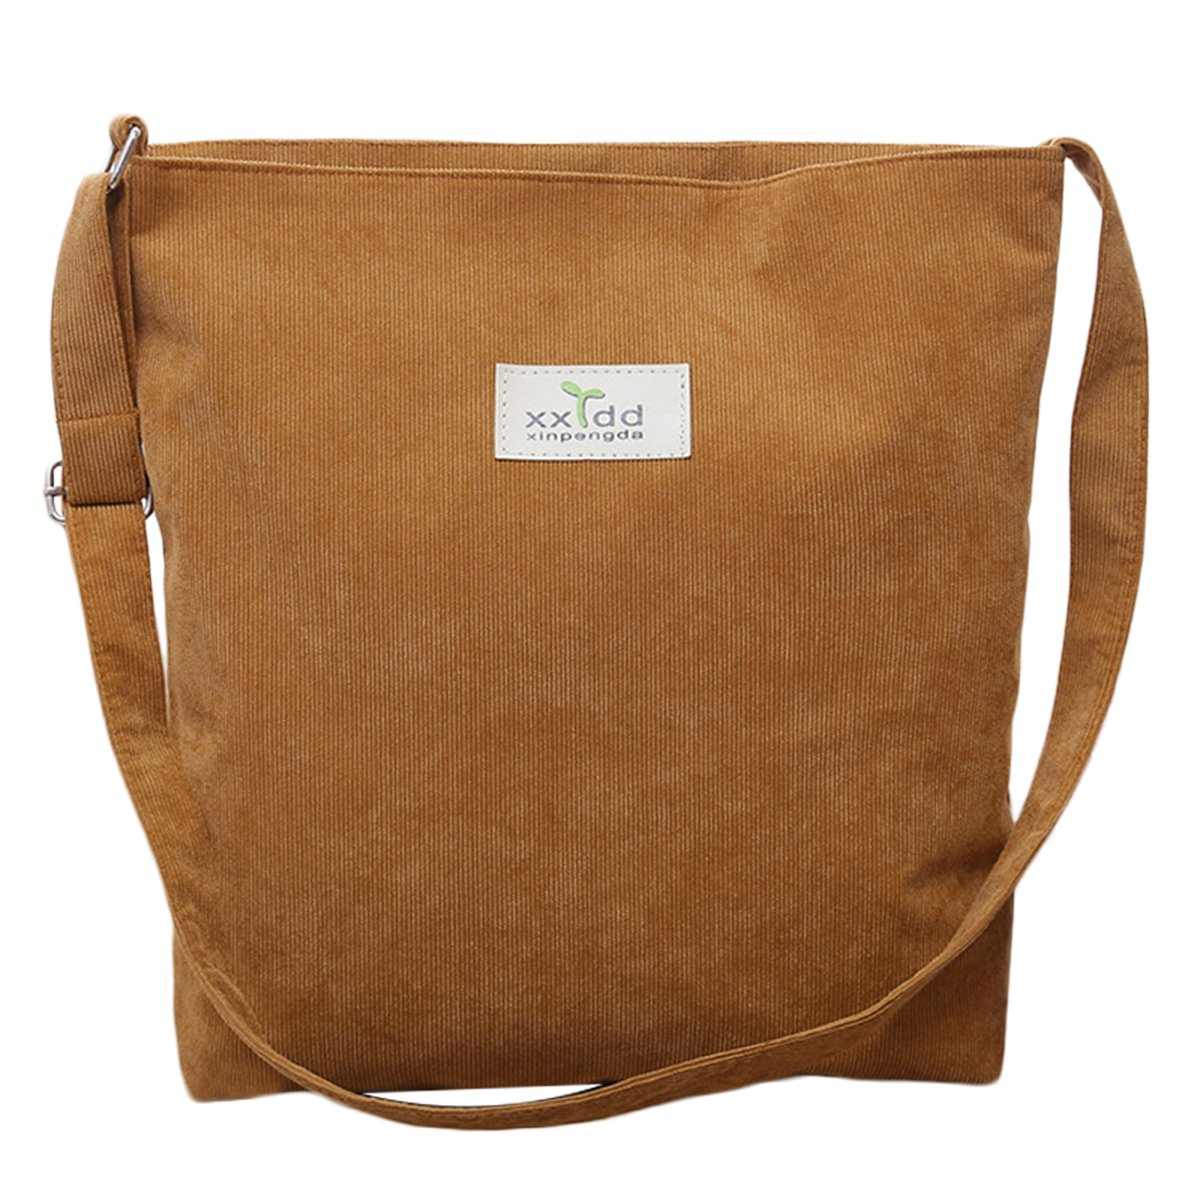 df155d030154 Amazon.com: Fanspack Women's Tote Handbags Casual Lightweight ...